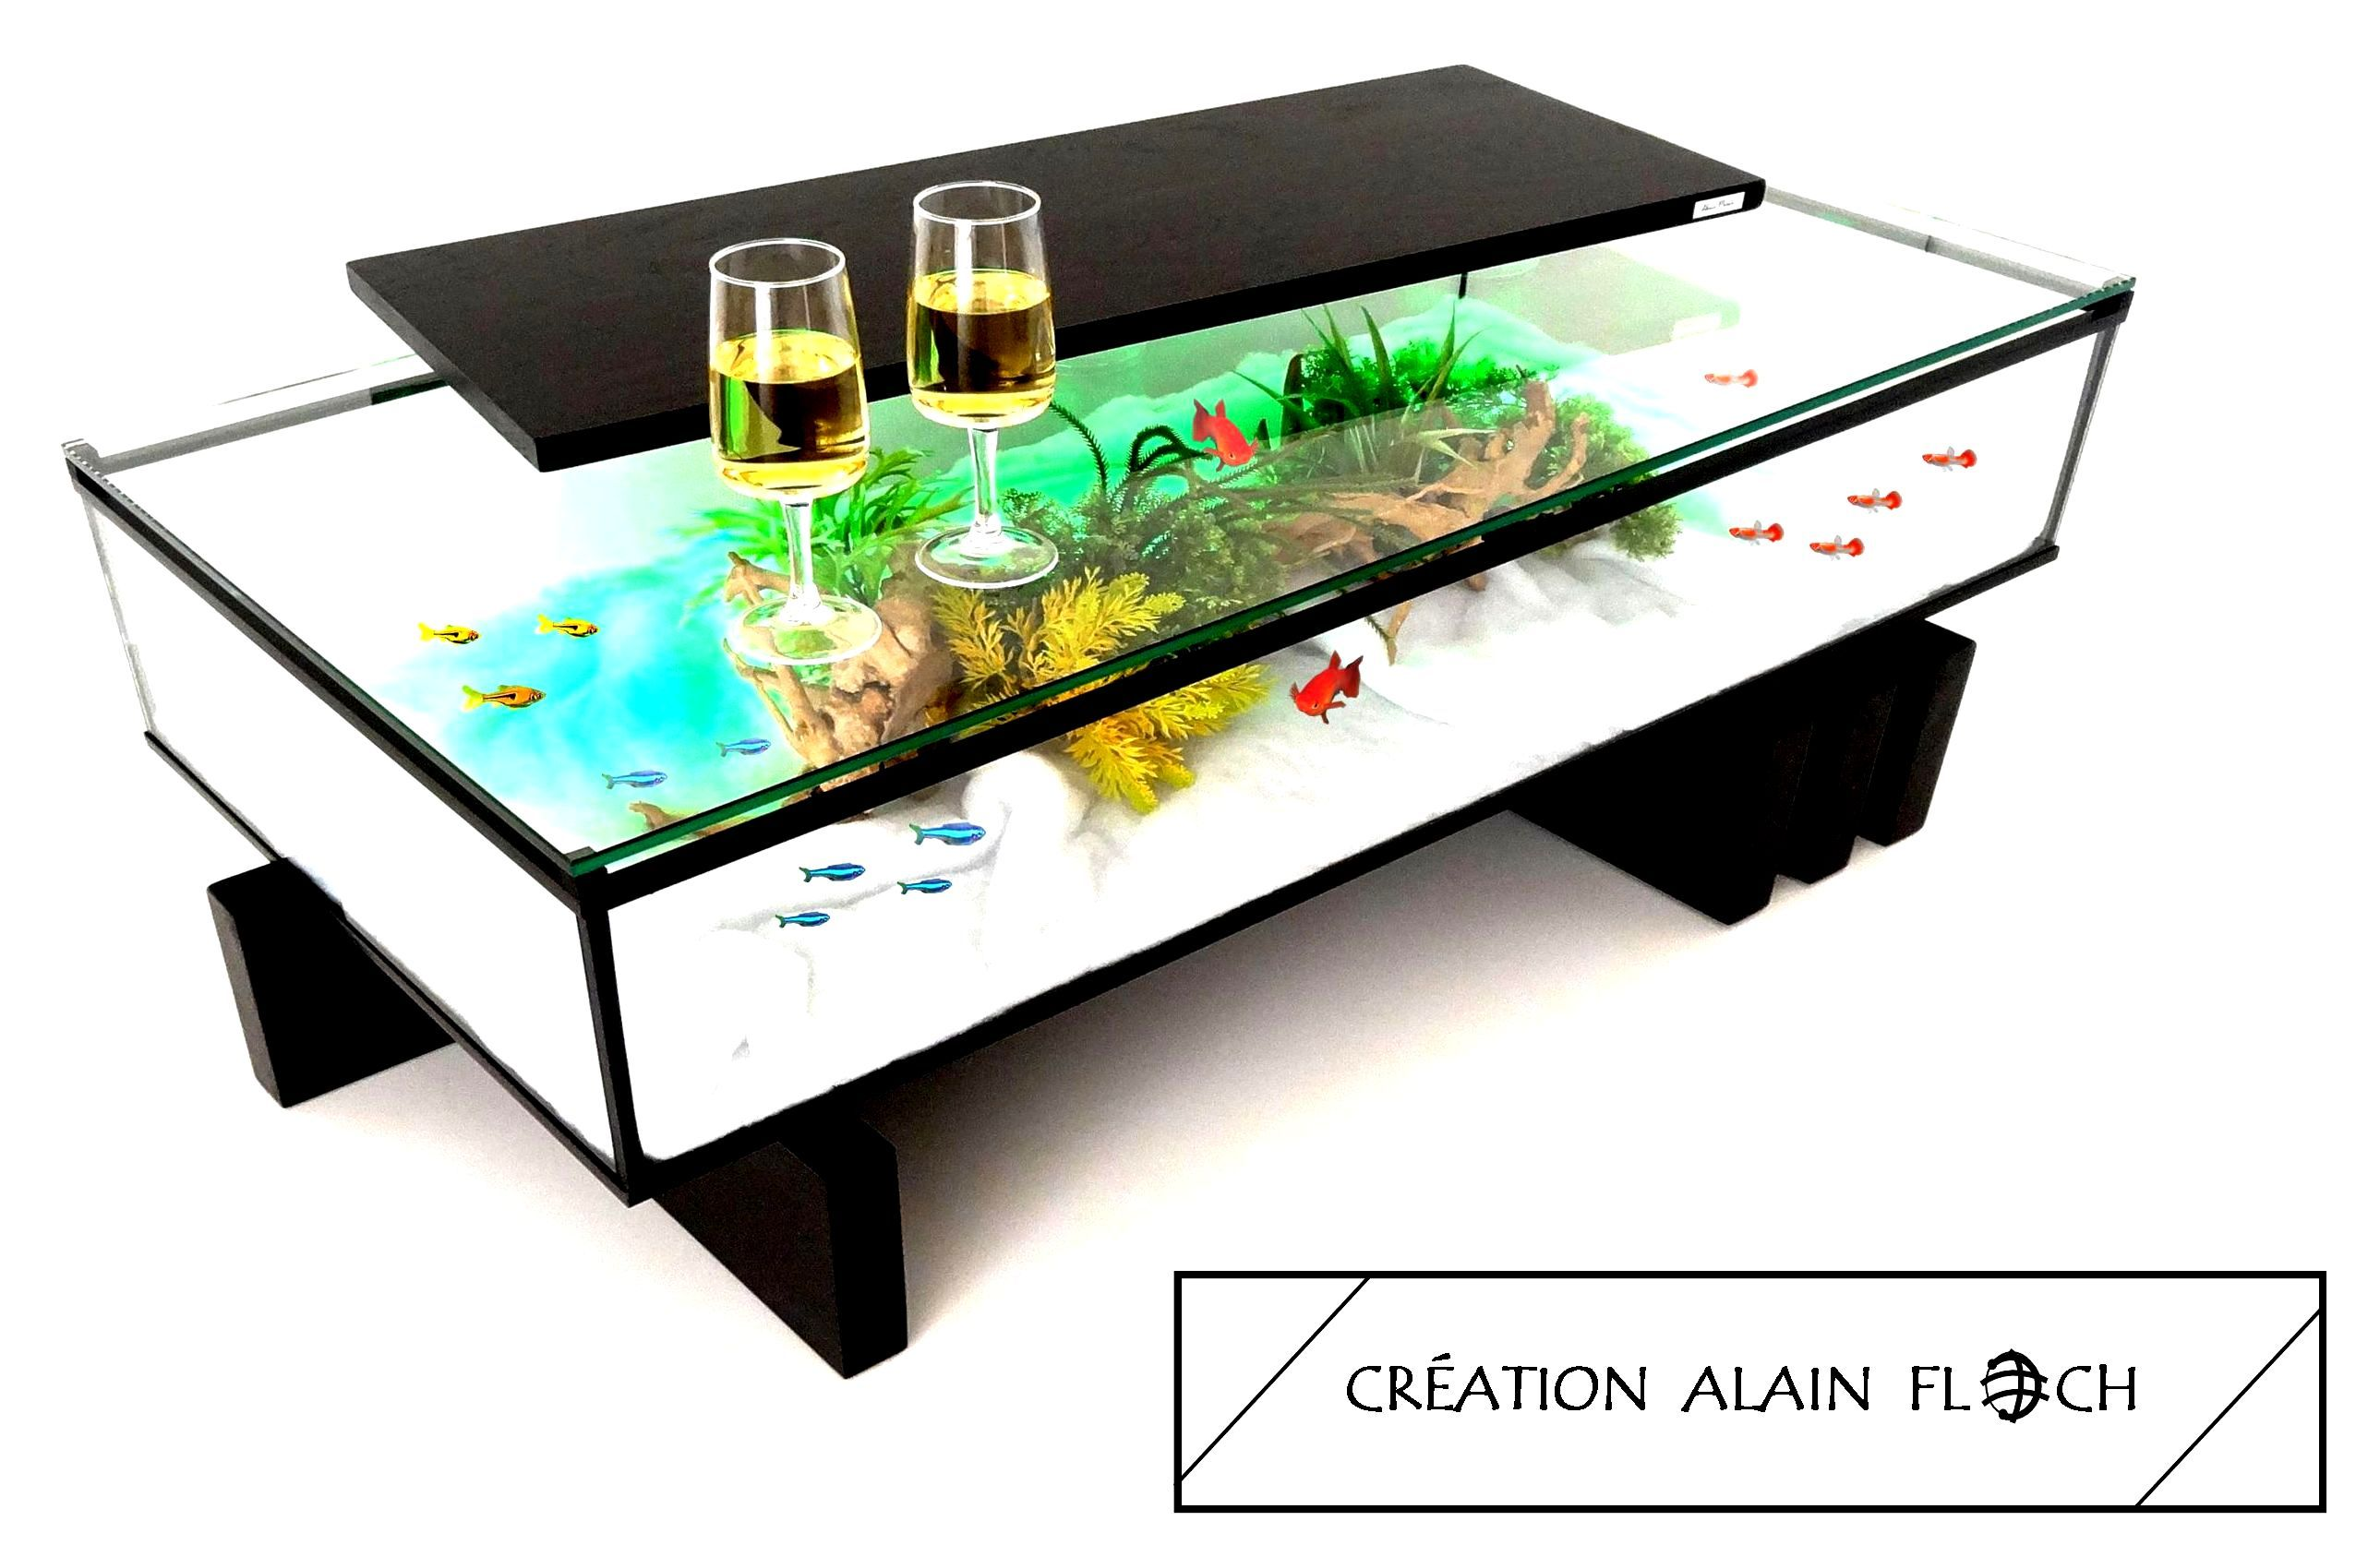 Table Basse Amarina Table Basse Aquarium Table De Salon Design Table De Salon